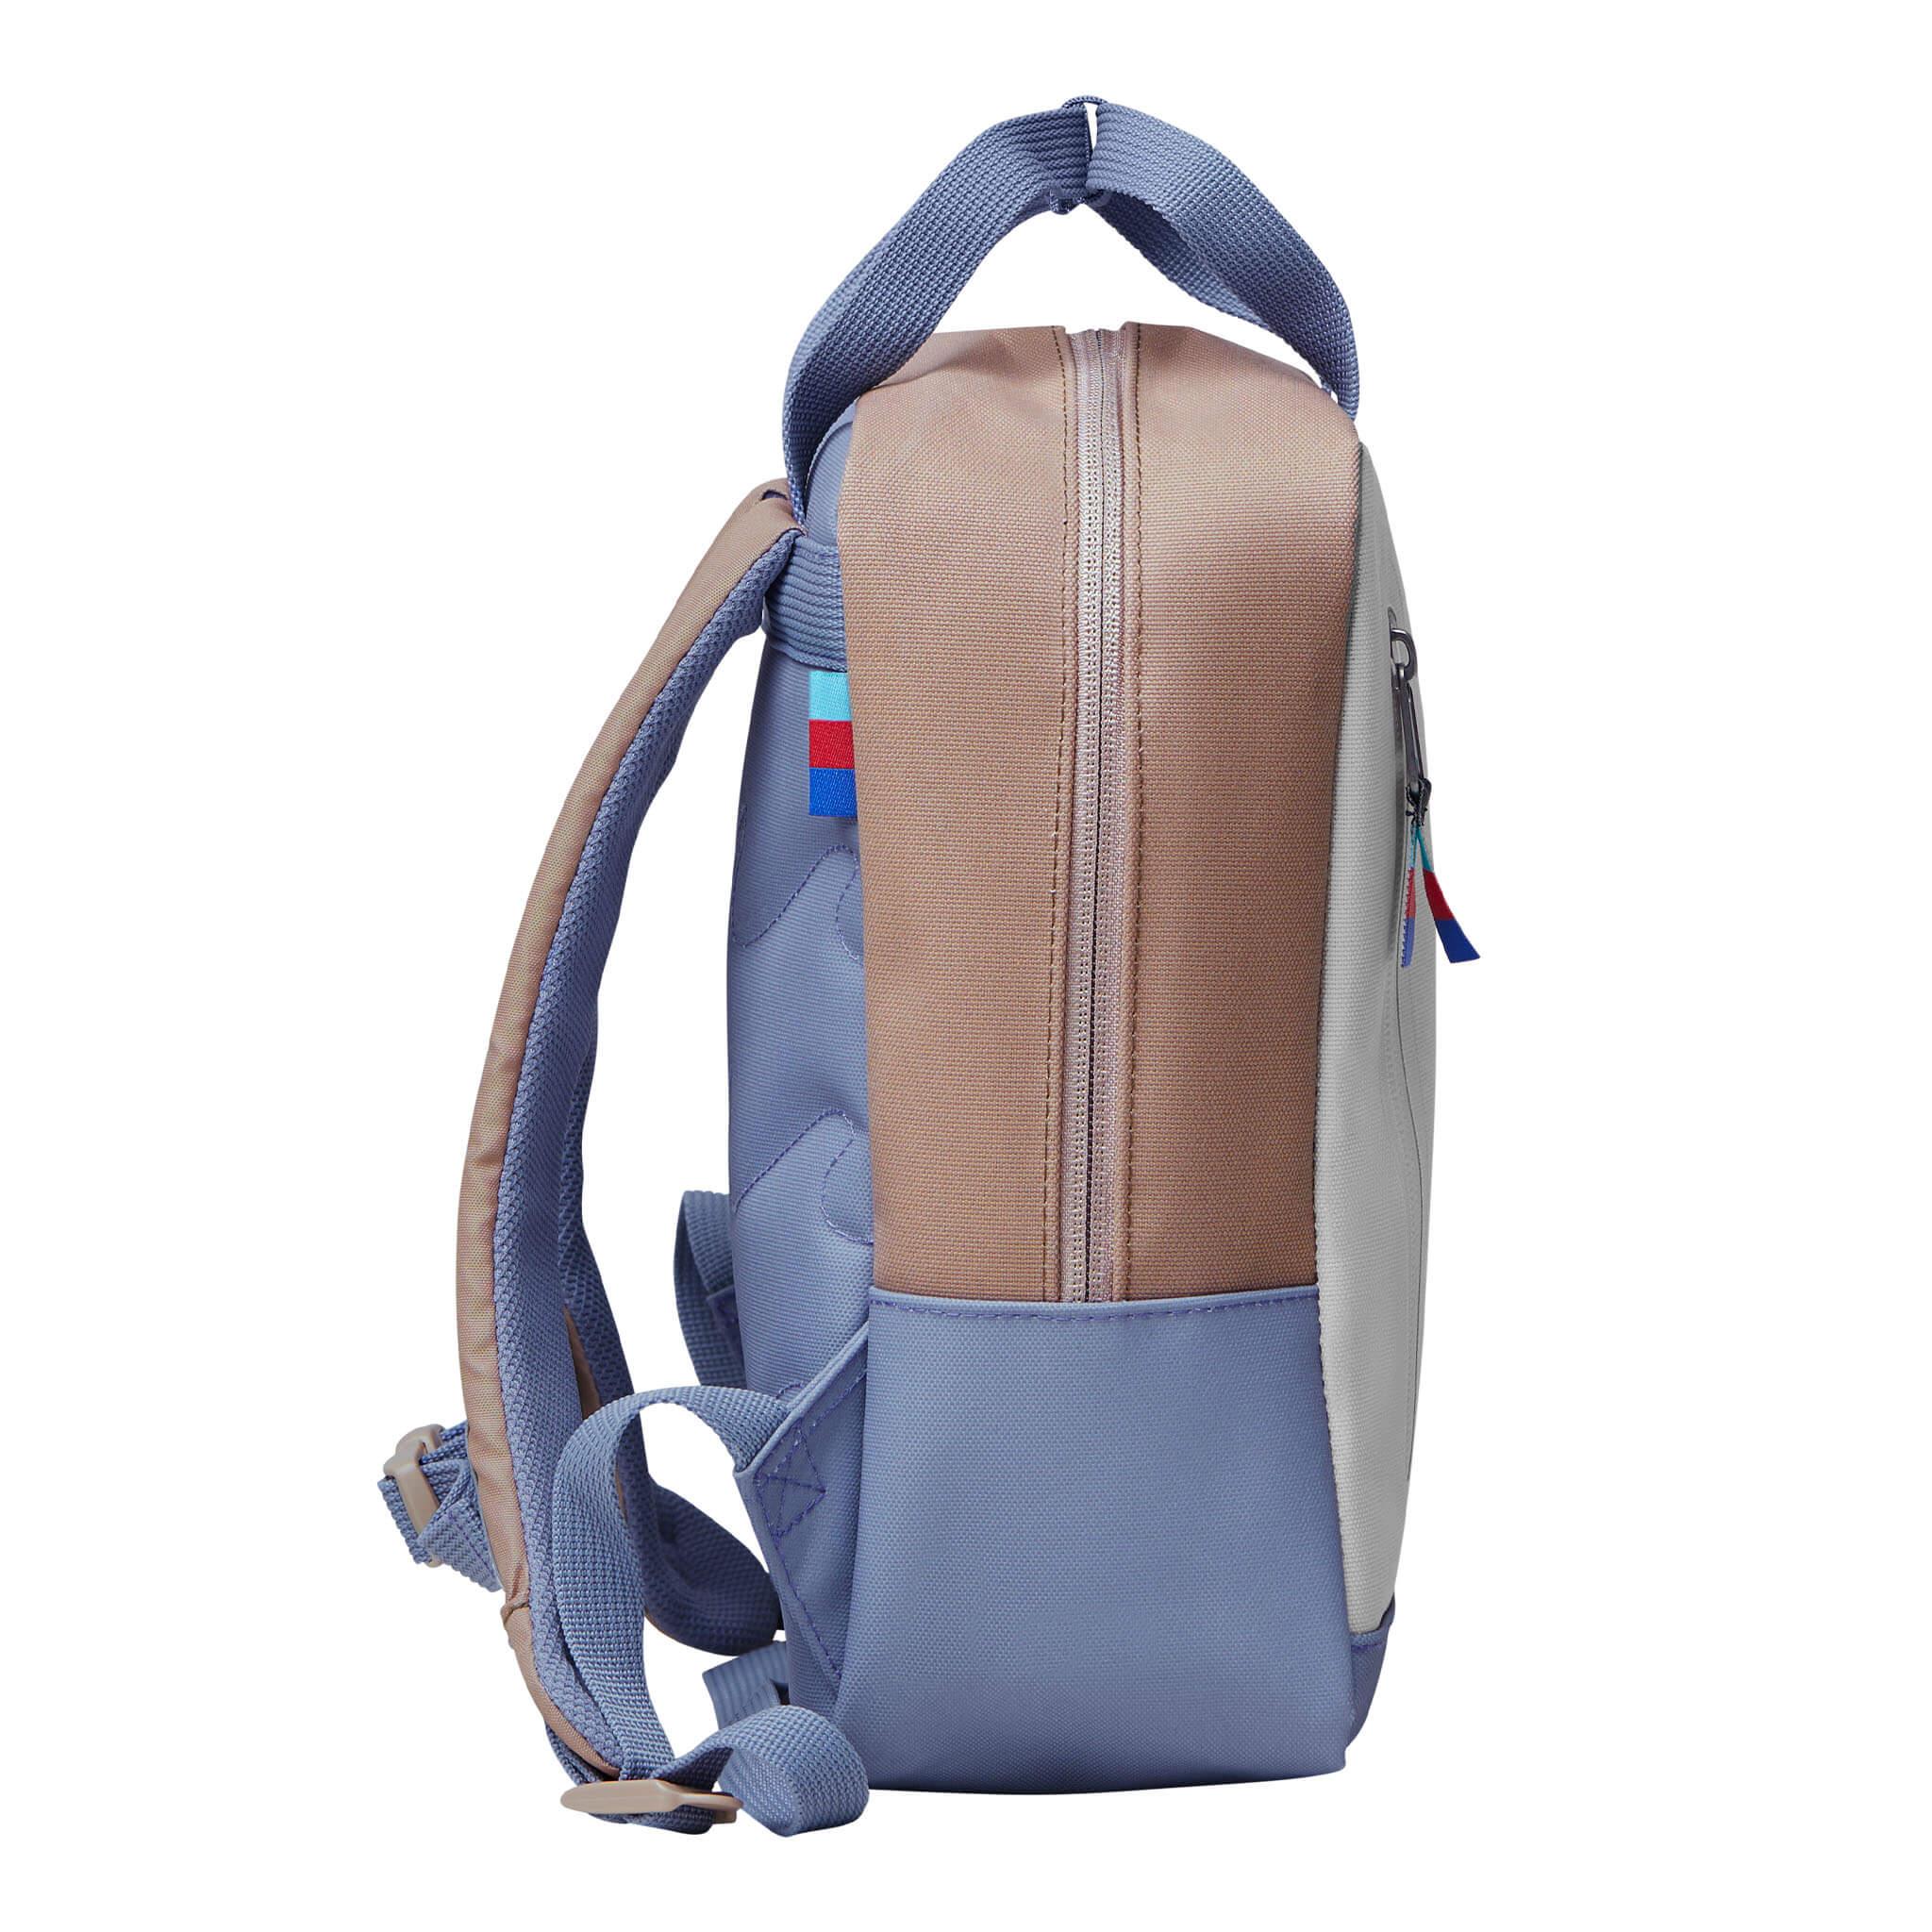 Got Bag Kids Collection- Daypack Mini - 5 Liter - Soft Shell Multi